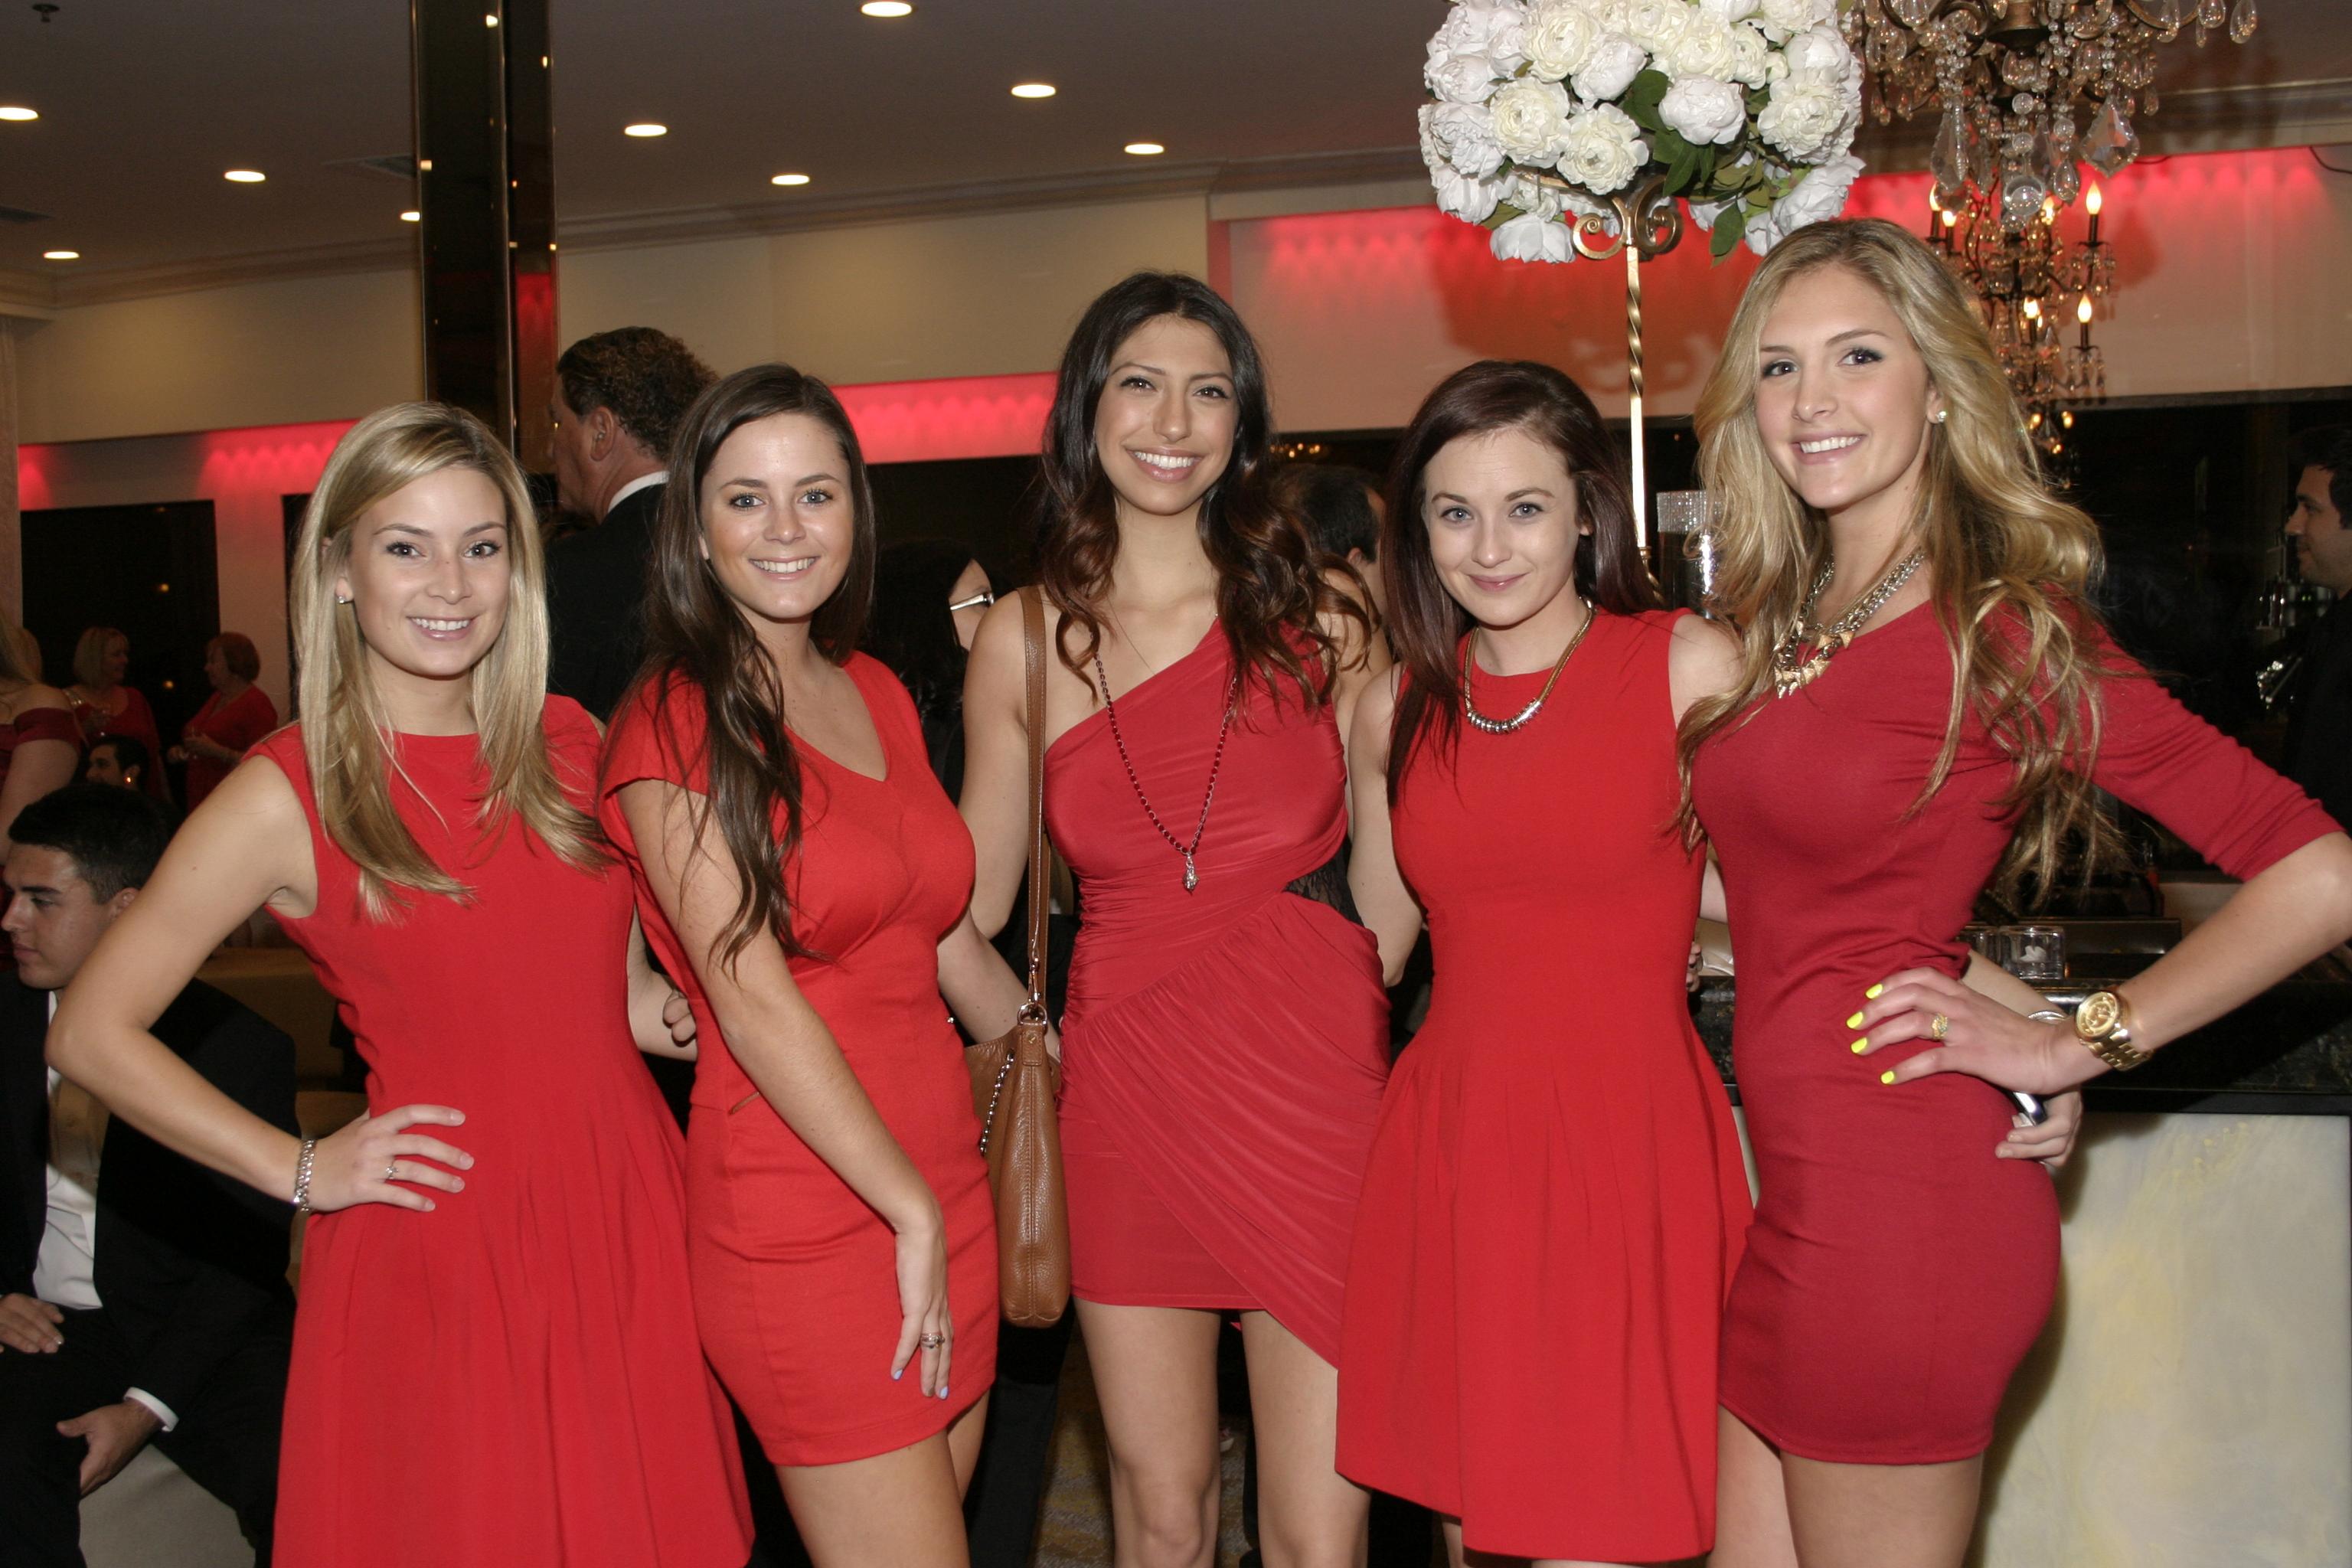 Brandview Ballroom Hosts Csuns 9th Annual Red Dress Ball Bringing